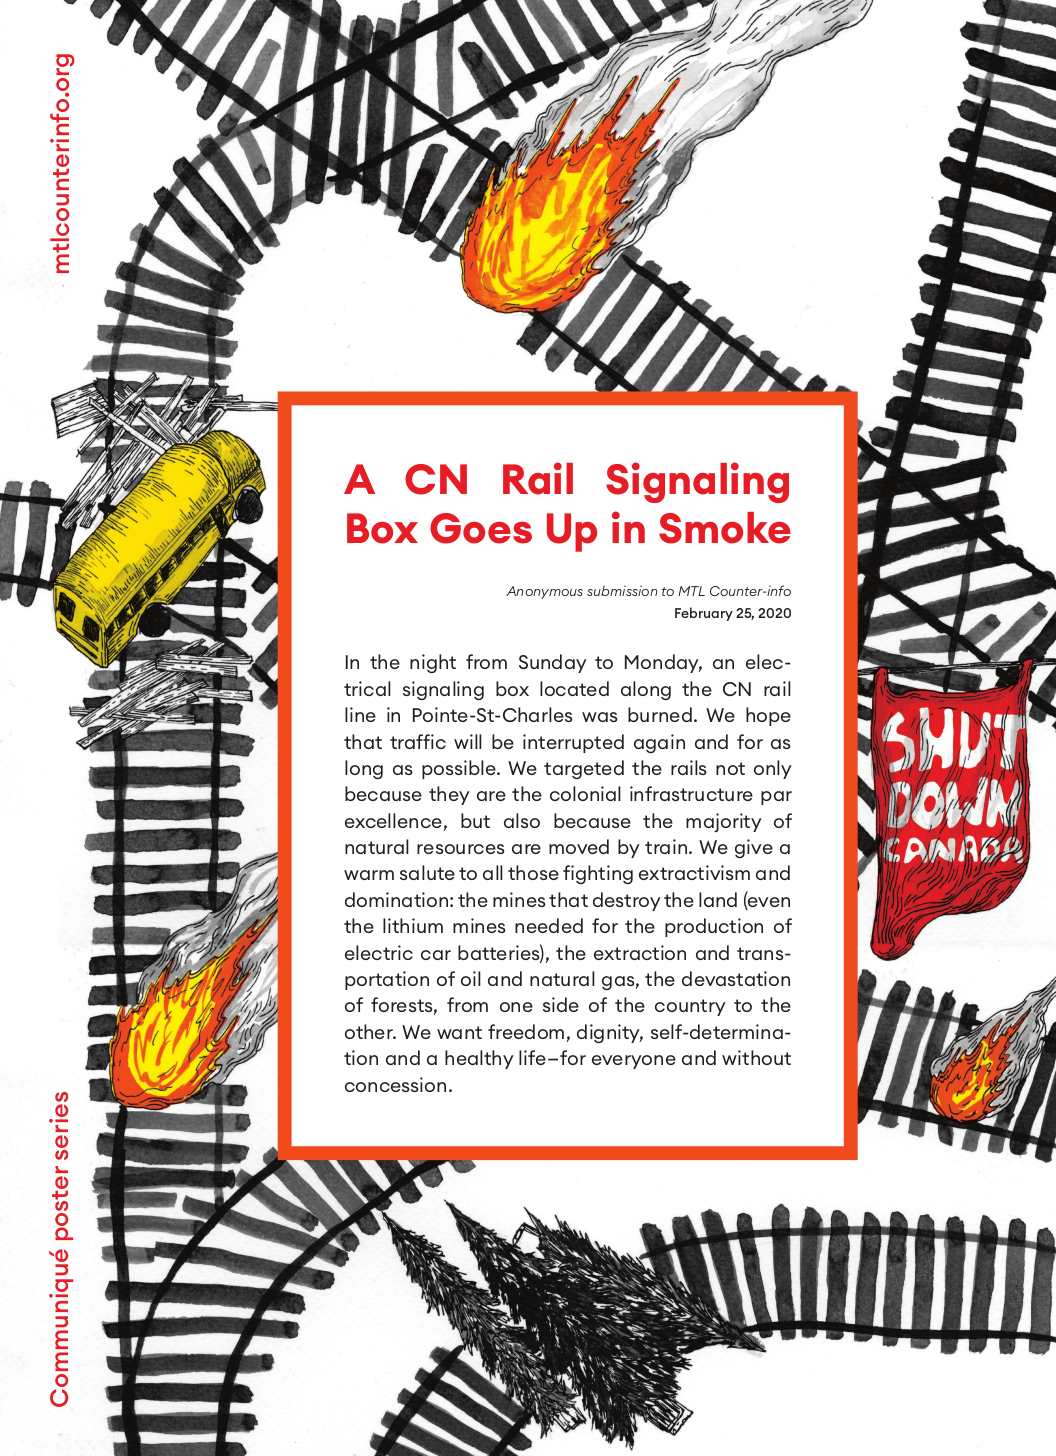 A CN Rail Signaling Box Goes Up in Smoke